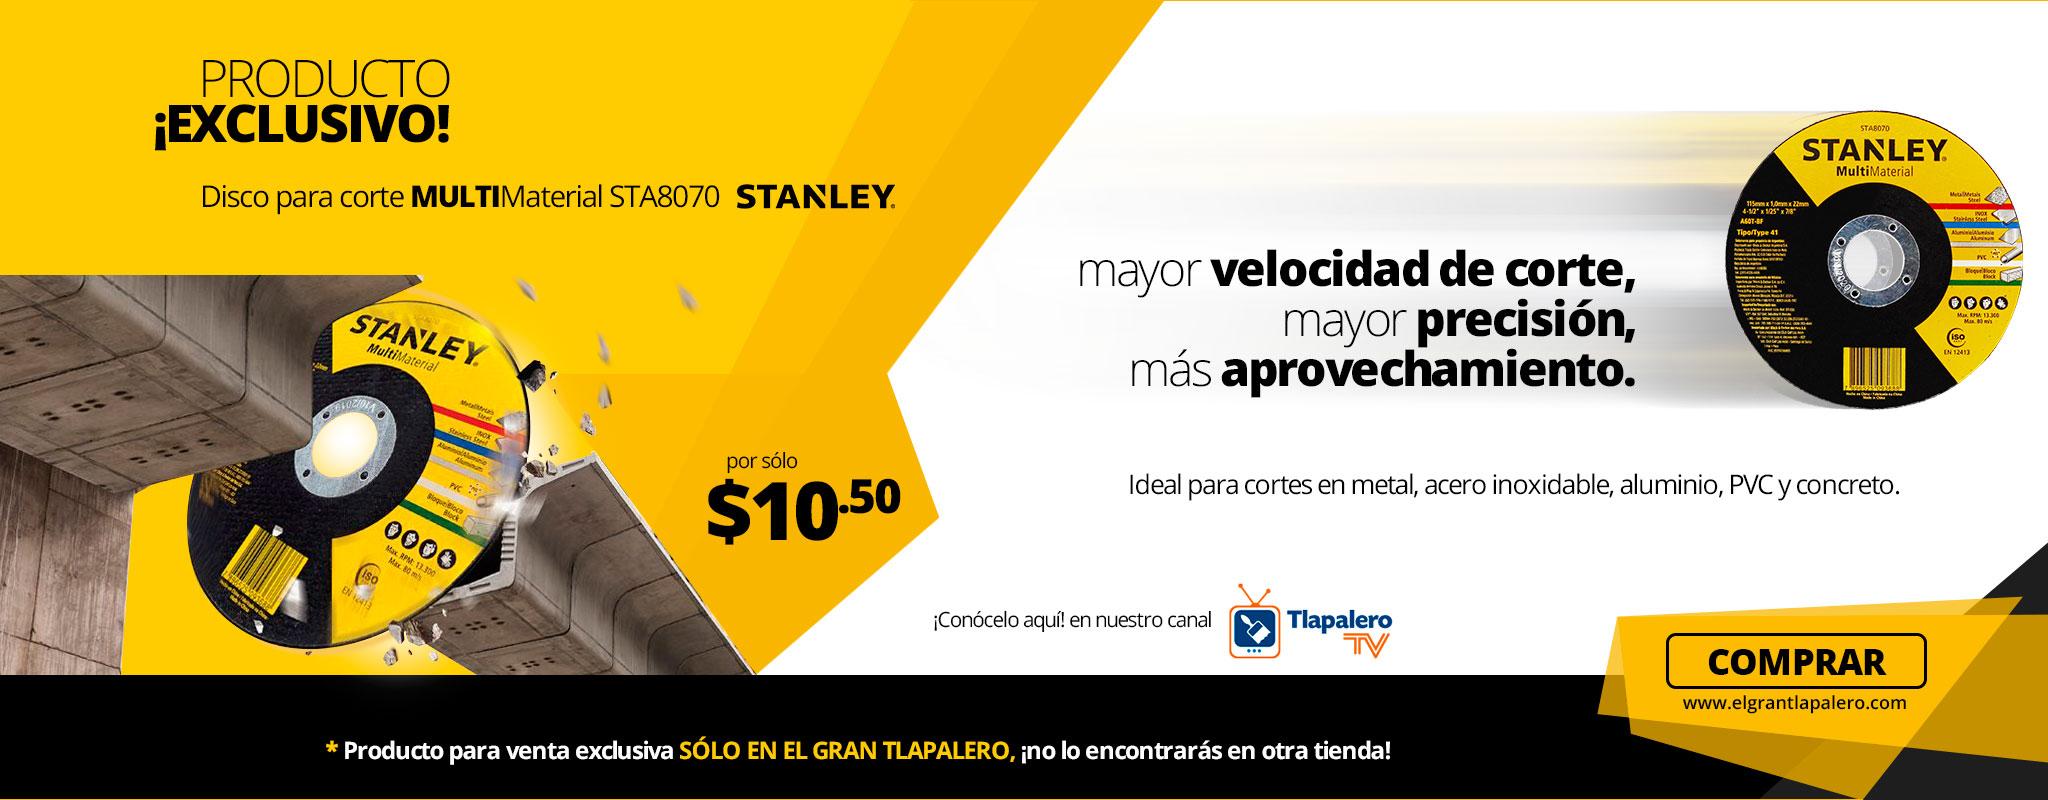 Disco para corte MULTIMATERIAL ST8070 Stanley